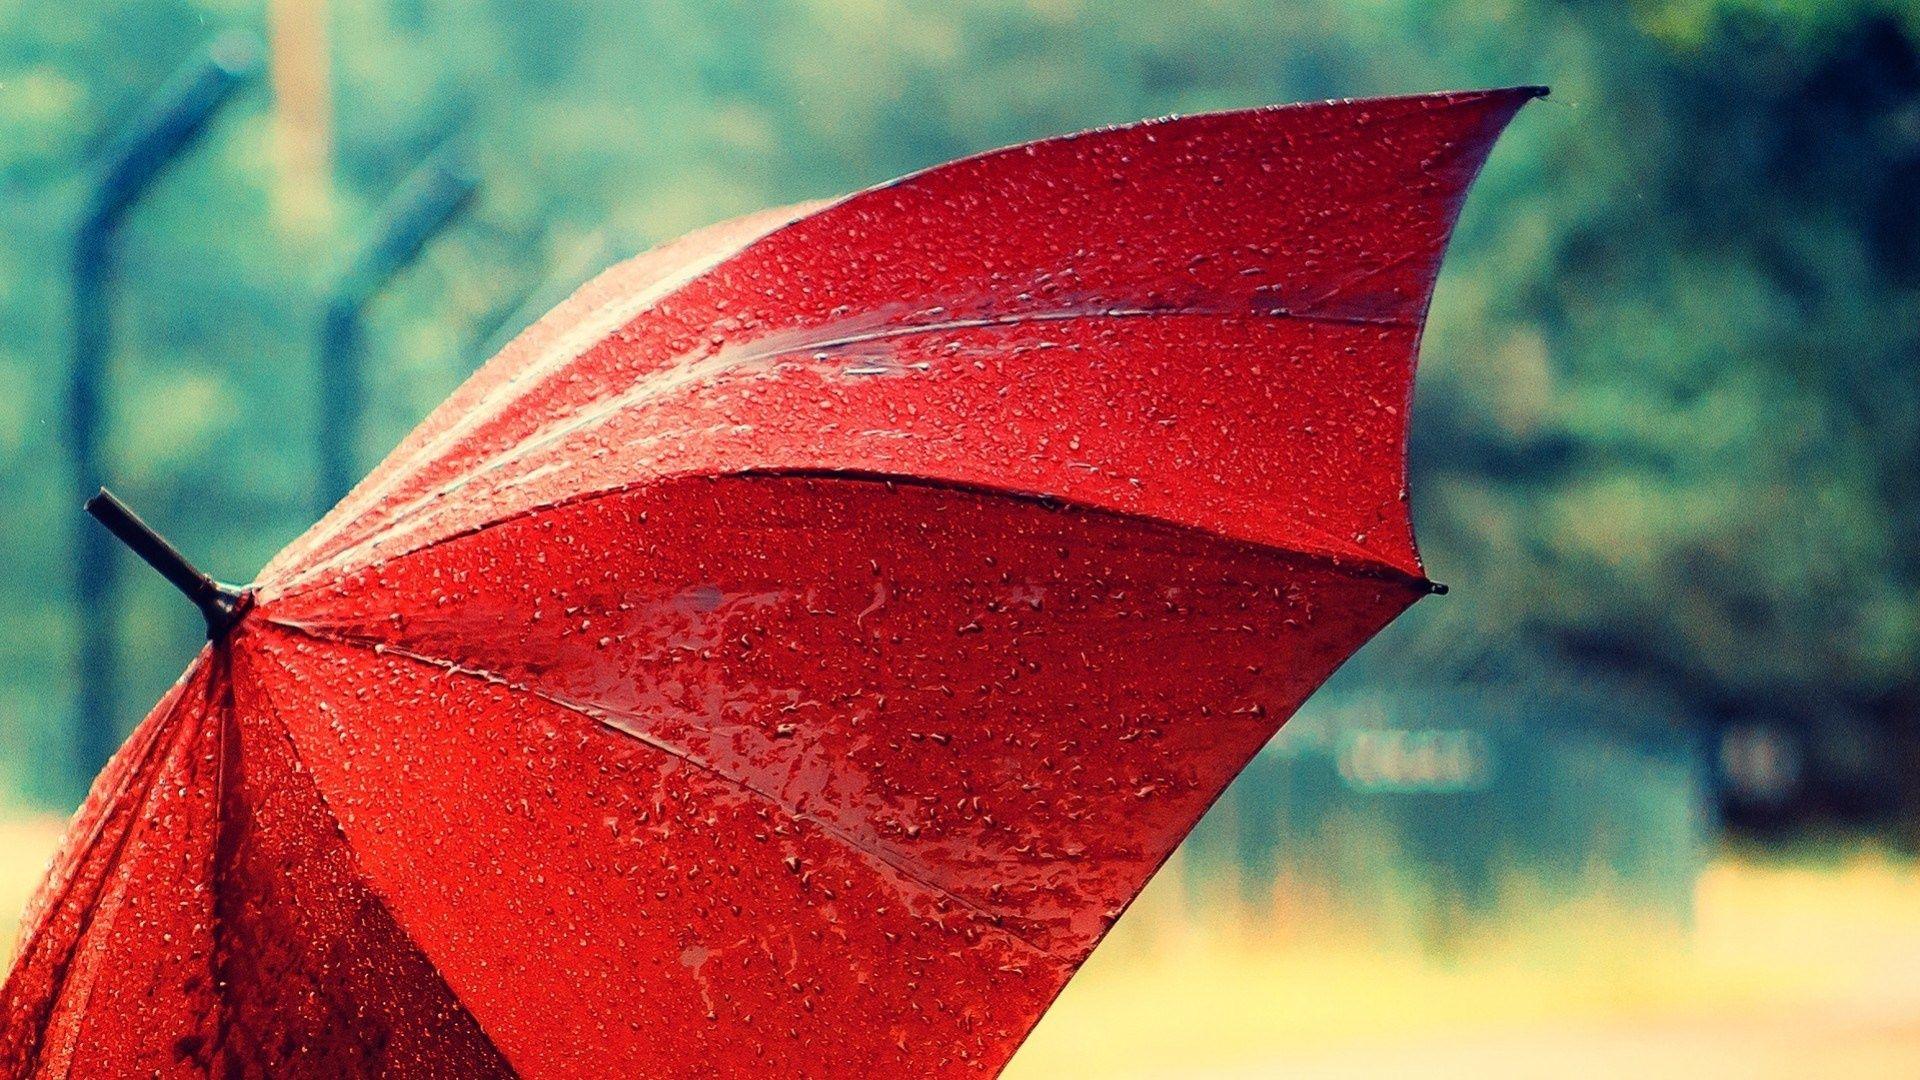 Find Out Red Umbrella Wallpaper On Hdpicorner